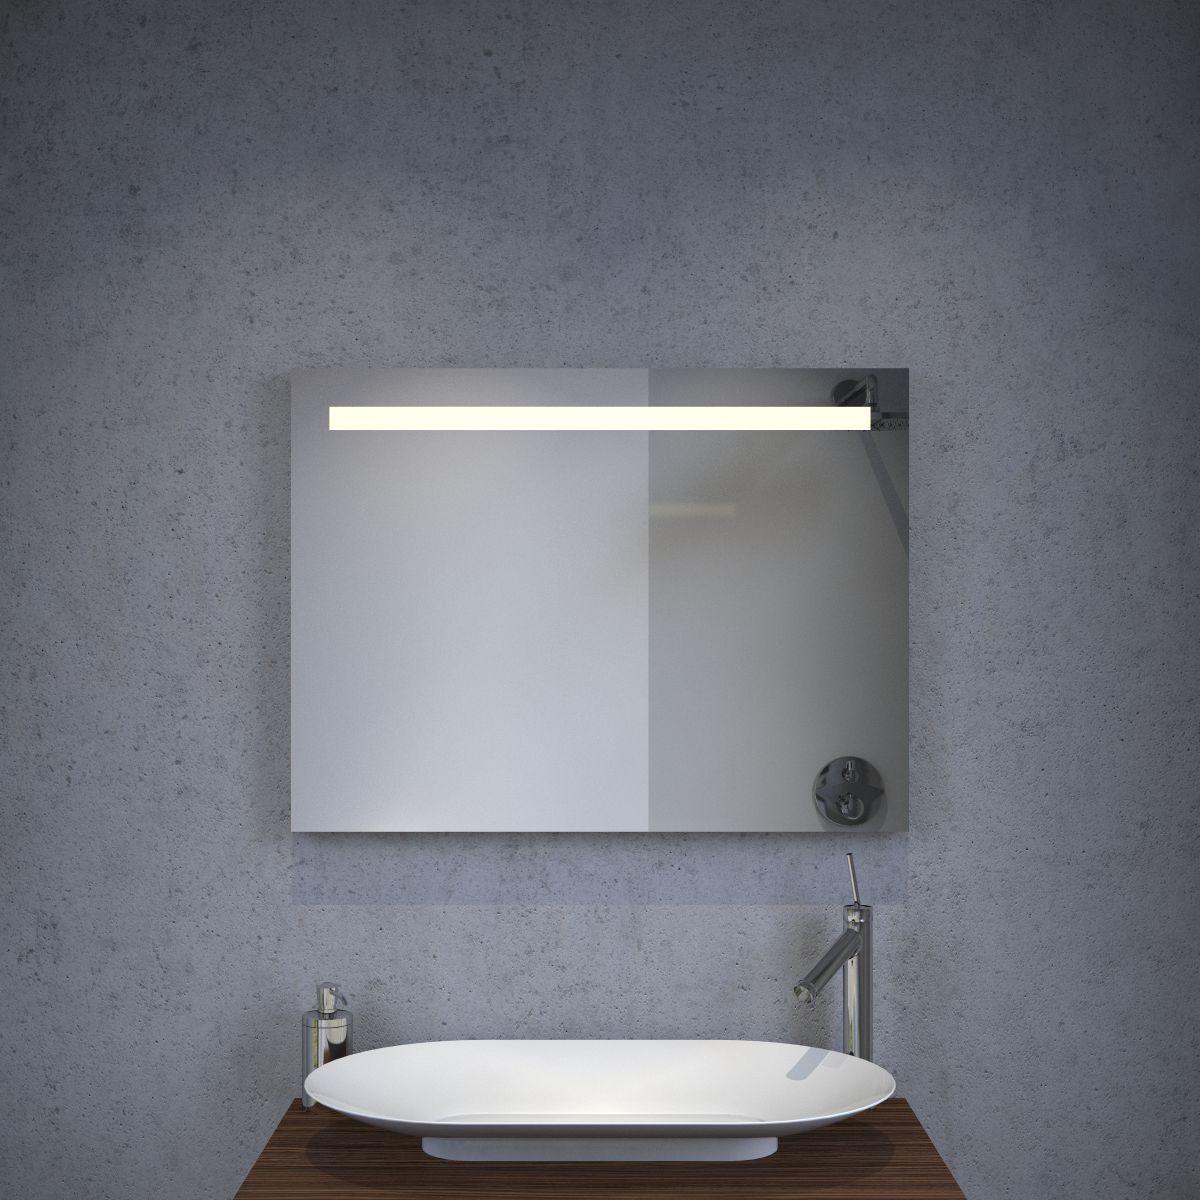 Badkamer led spiegel met verwarming en sensor 80x60 cm for Spiegel 80x60